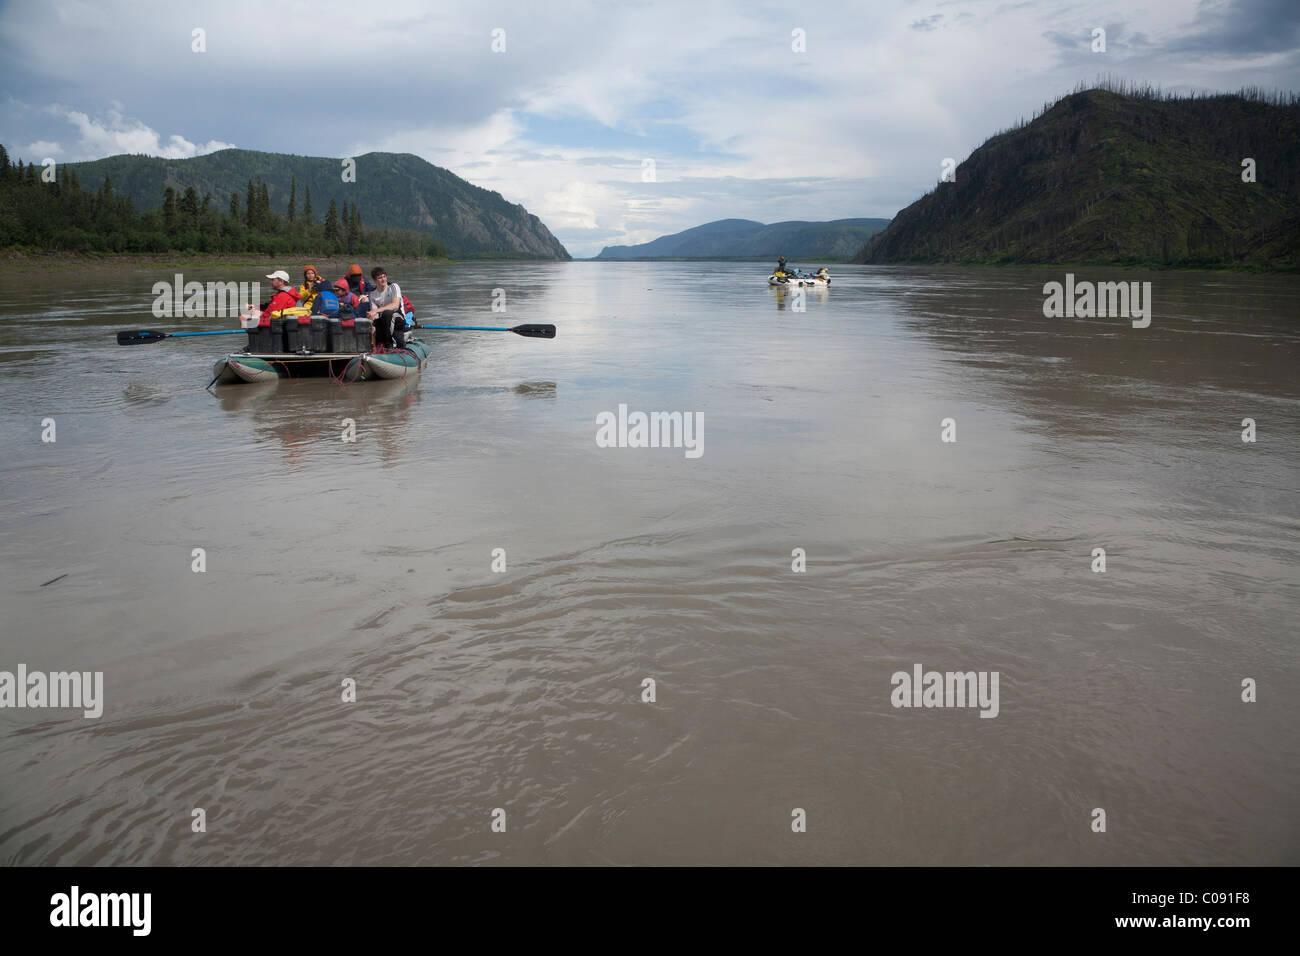 Two rafts of families float down the Yukon River, Yukon-Charley Rivers National Preserve, Interior Alaska, Summer - Stock Image